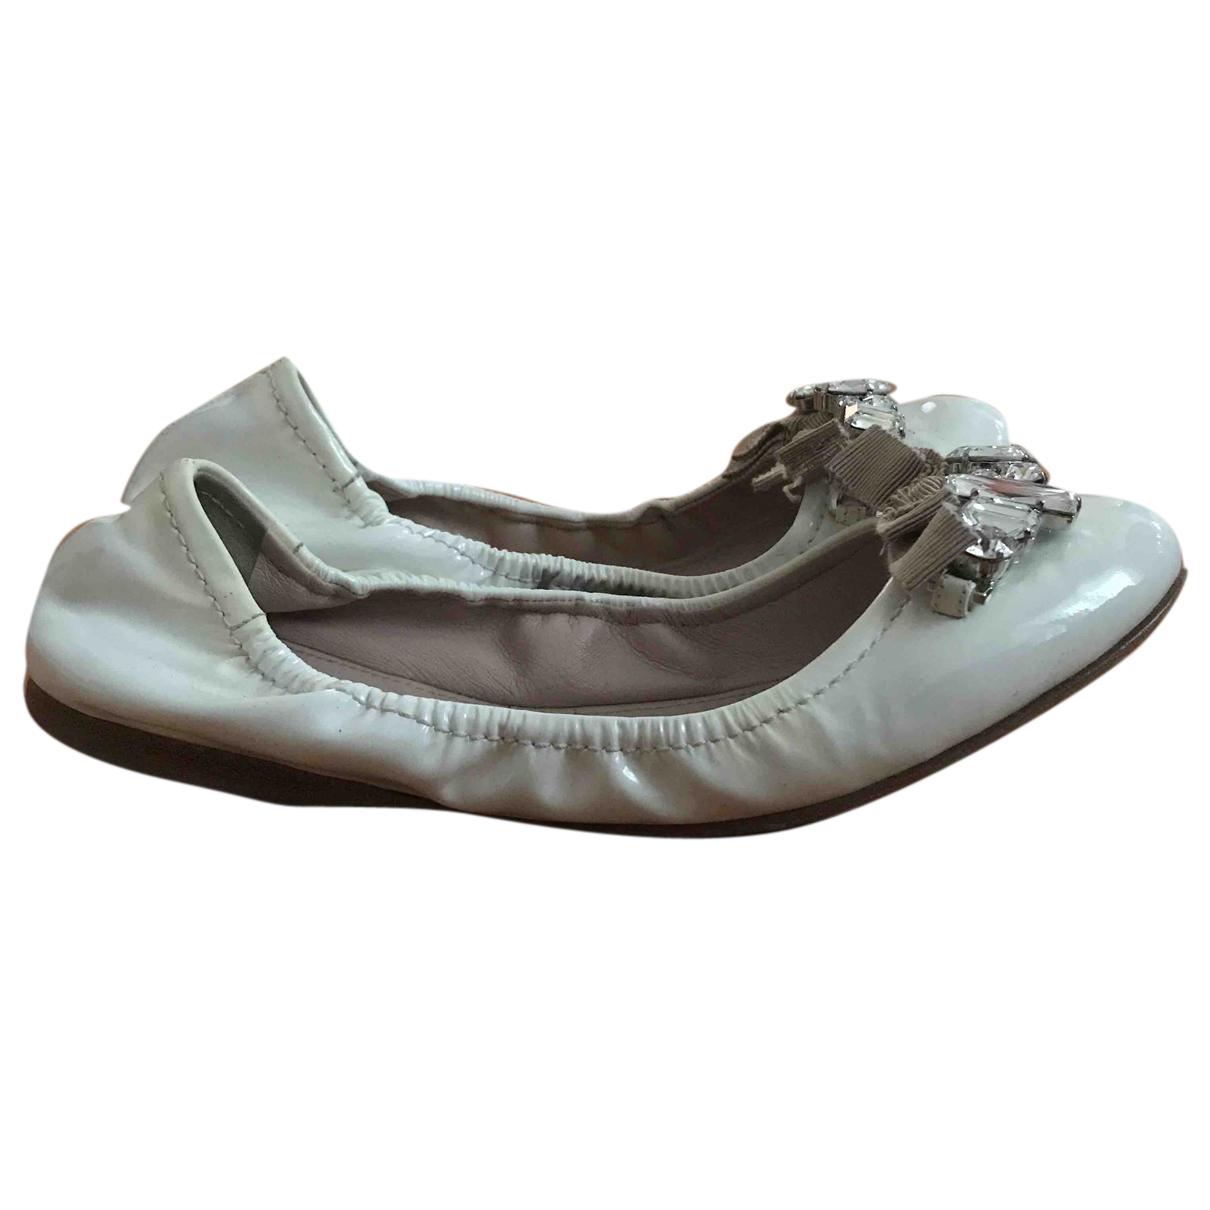 Miu Miu N White Leather Ballet flats for Women 35 EU